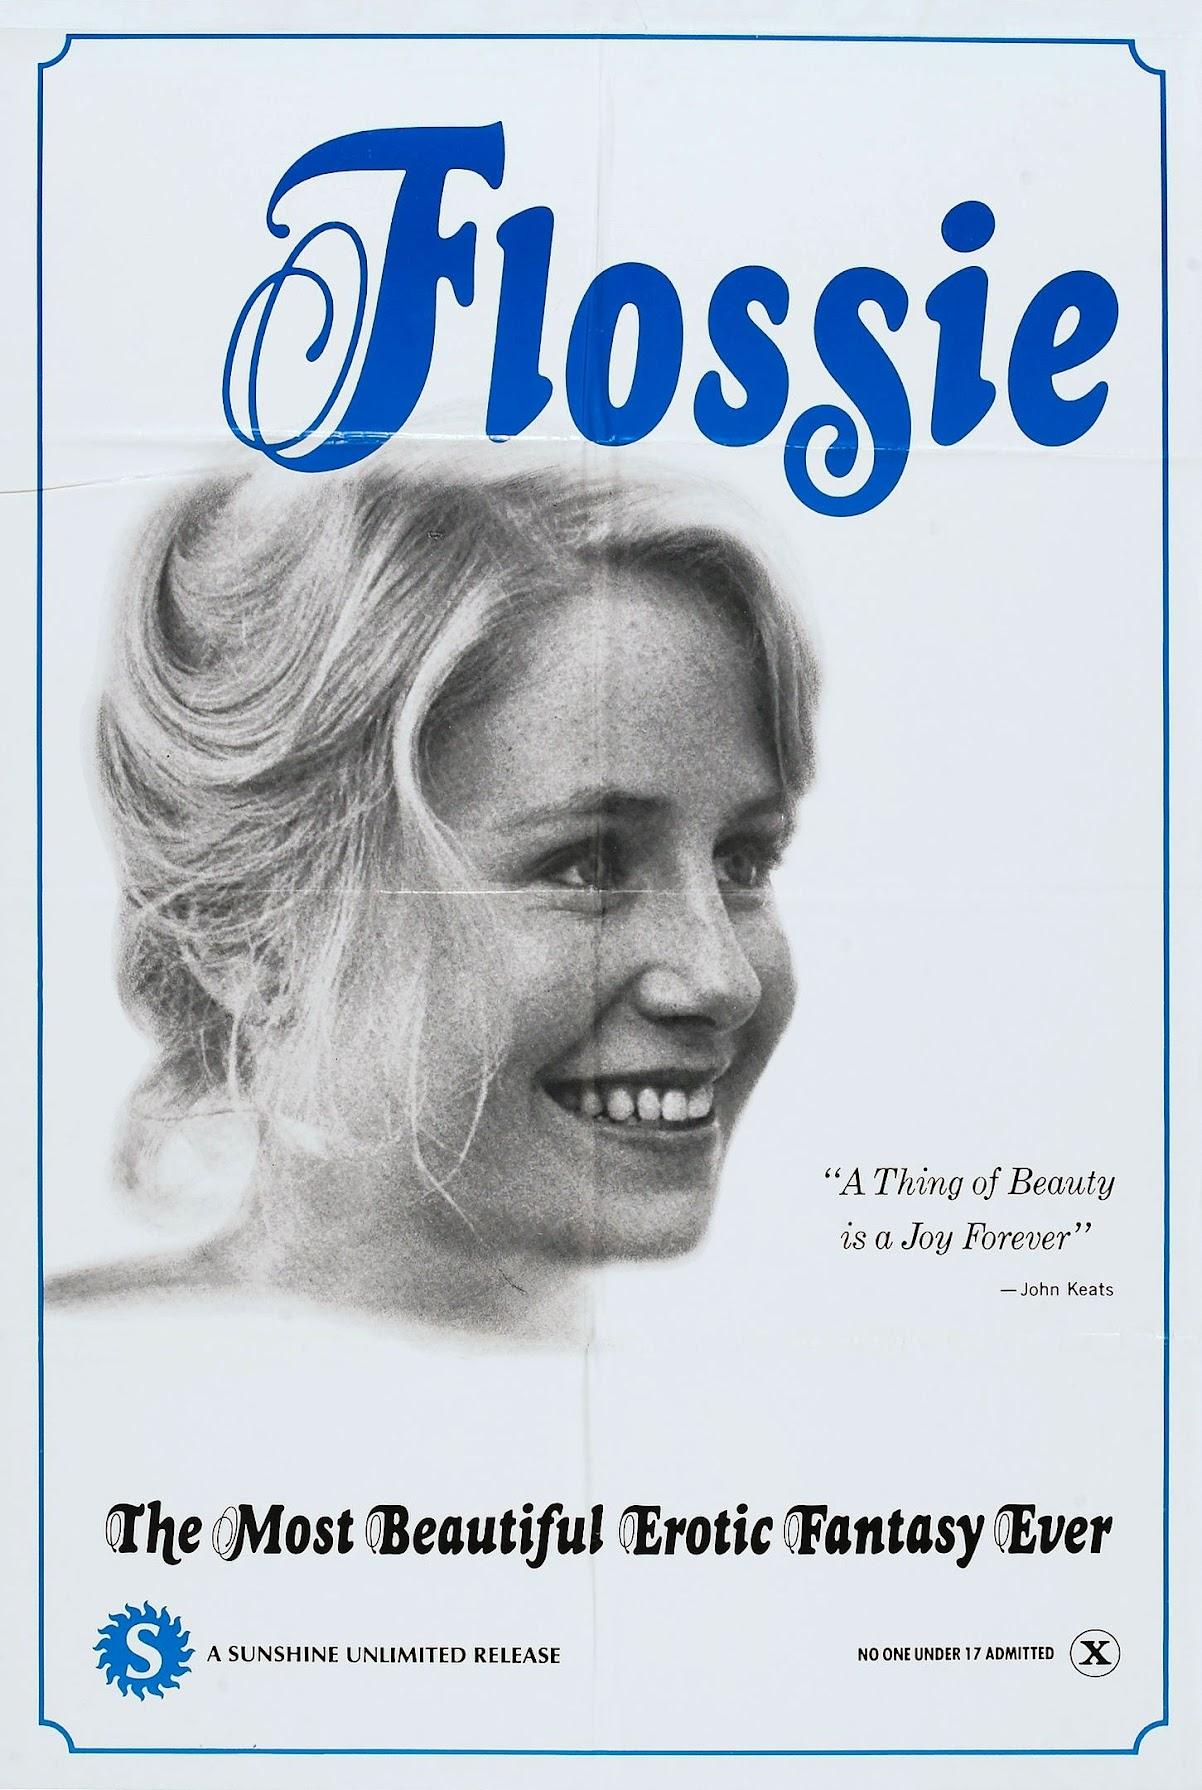 http://1.bp.blogspot.com/-sJtwwyzqx20/T8ZZwIWZ6aI/AAAAAAAAA0E/w4UKTMyxAKg/s1790/flossie_poster_01.jpg